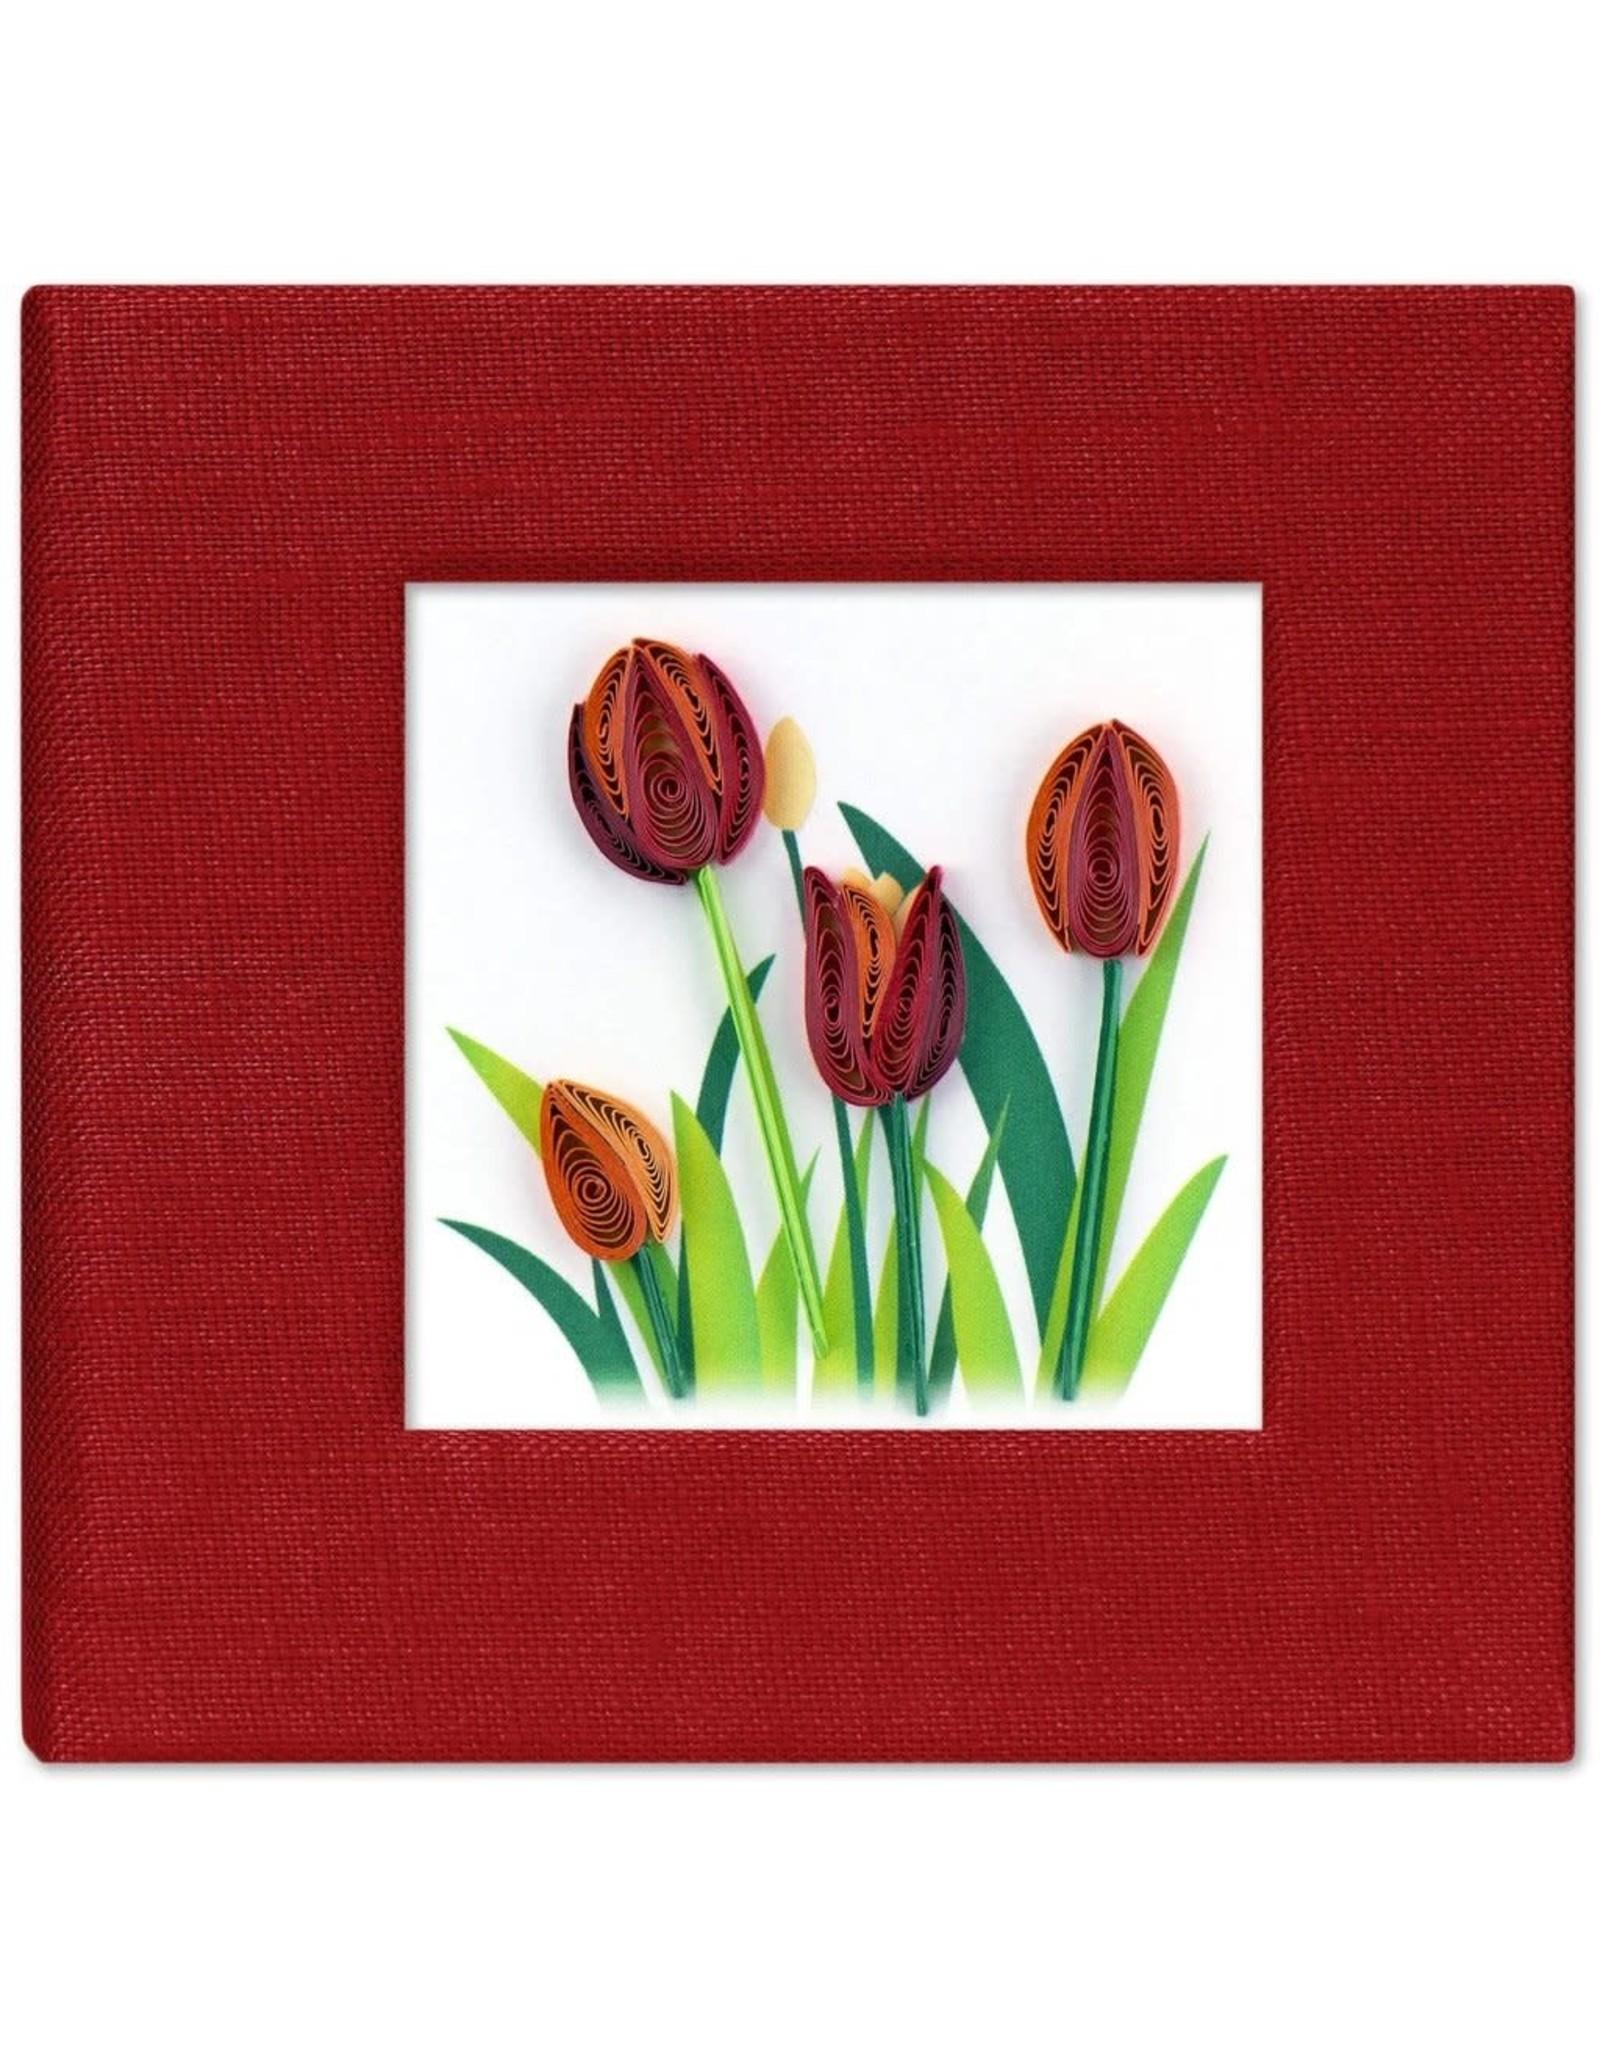 Quill Post It Notes, Red Tulip, Vietnam